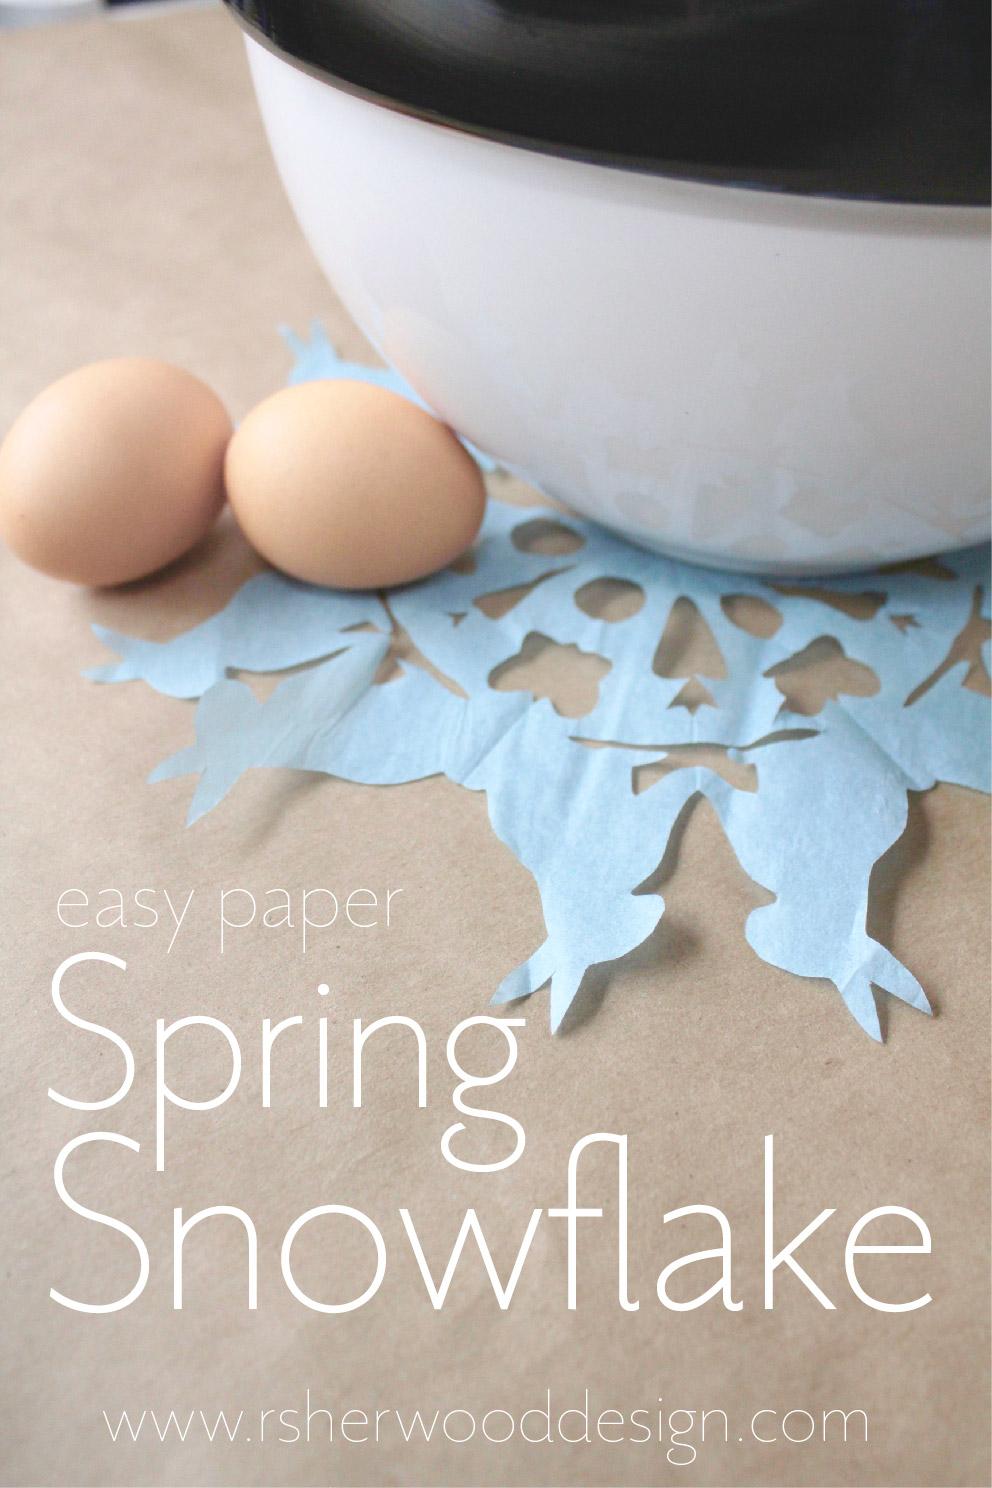 spring-snowflake-template-tutorial